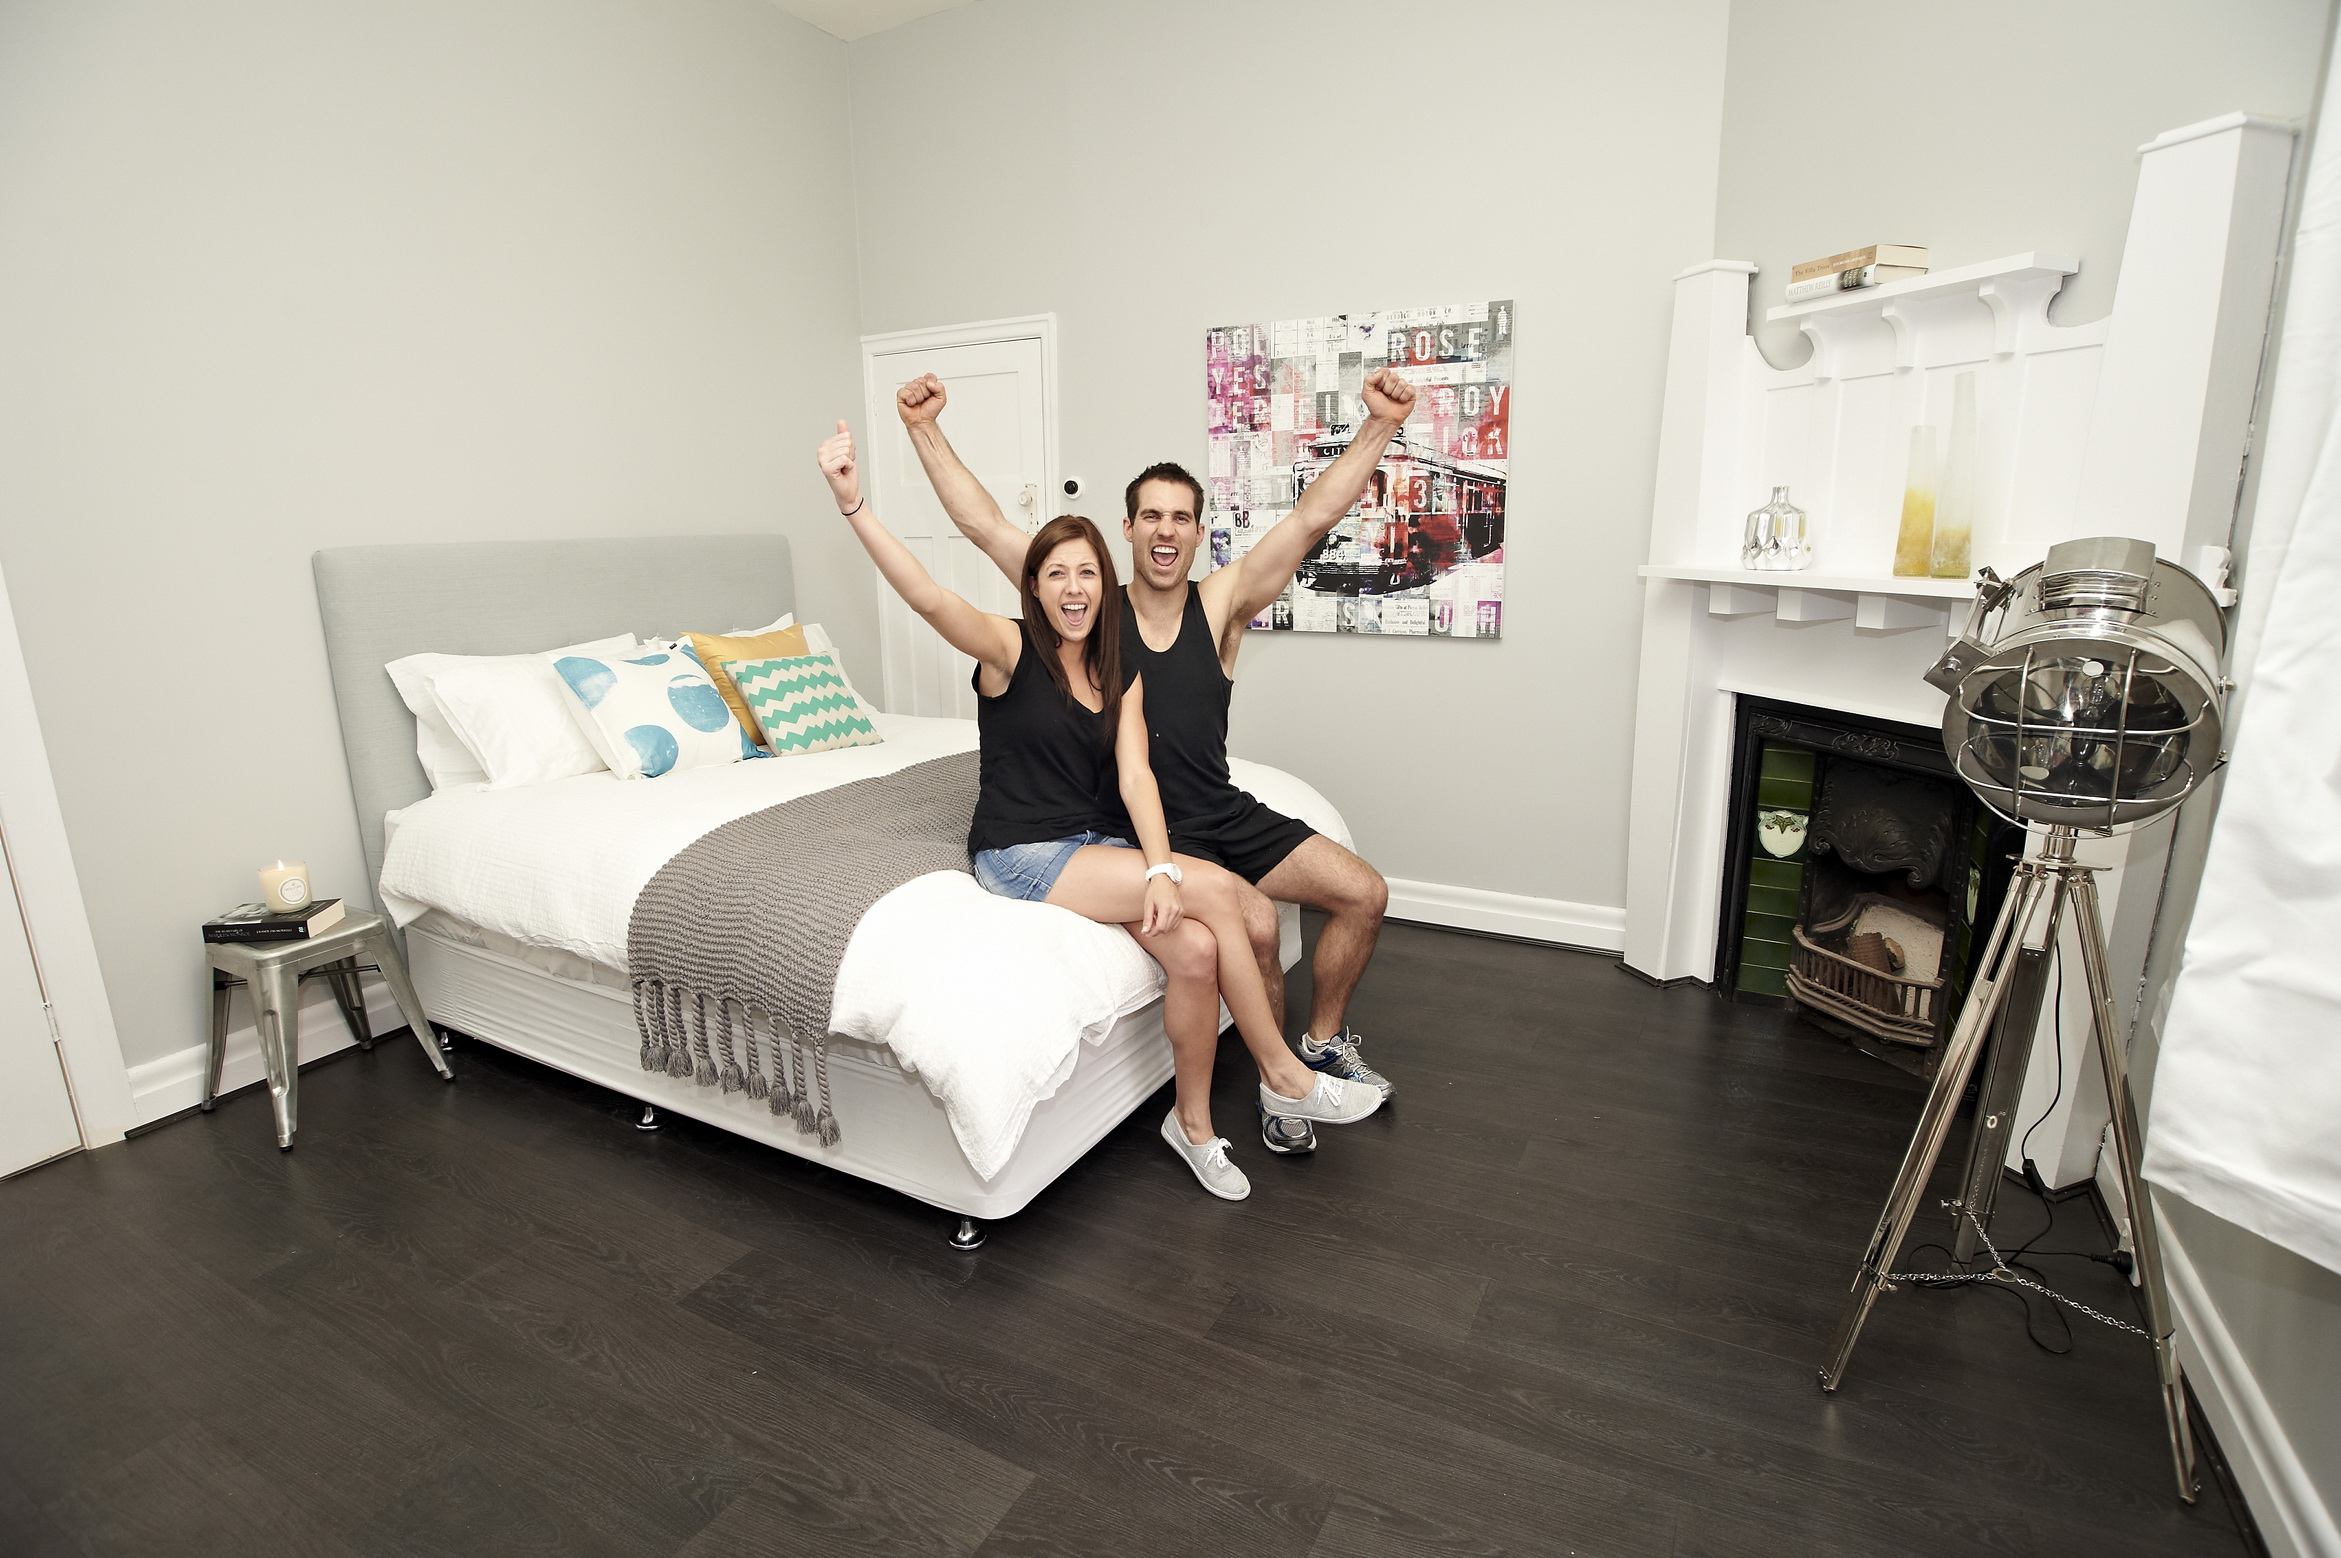 Dan and Danni celebrate their winning room on The Block 2012